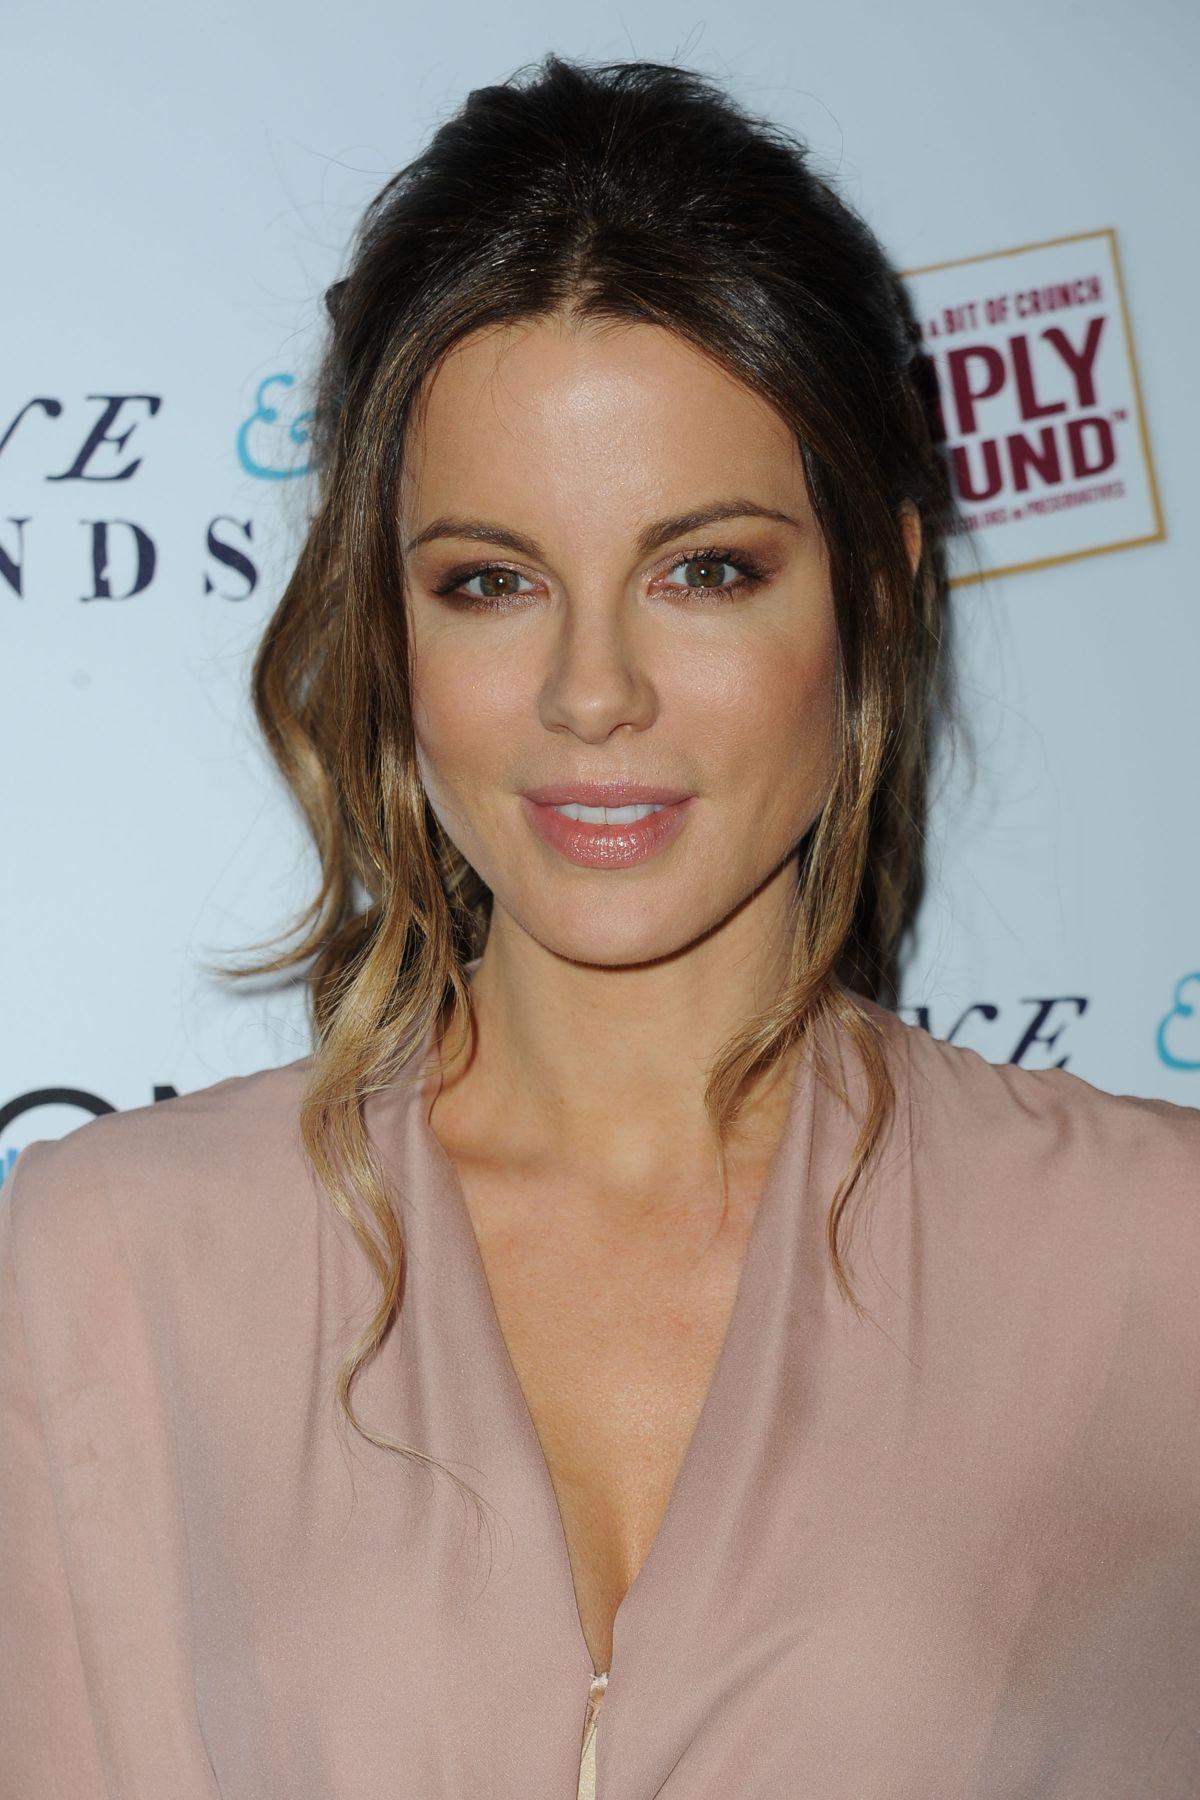 KATE BECKINSALE at 'Love & Frienship' Screening in New ... Kate Beckinsale